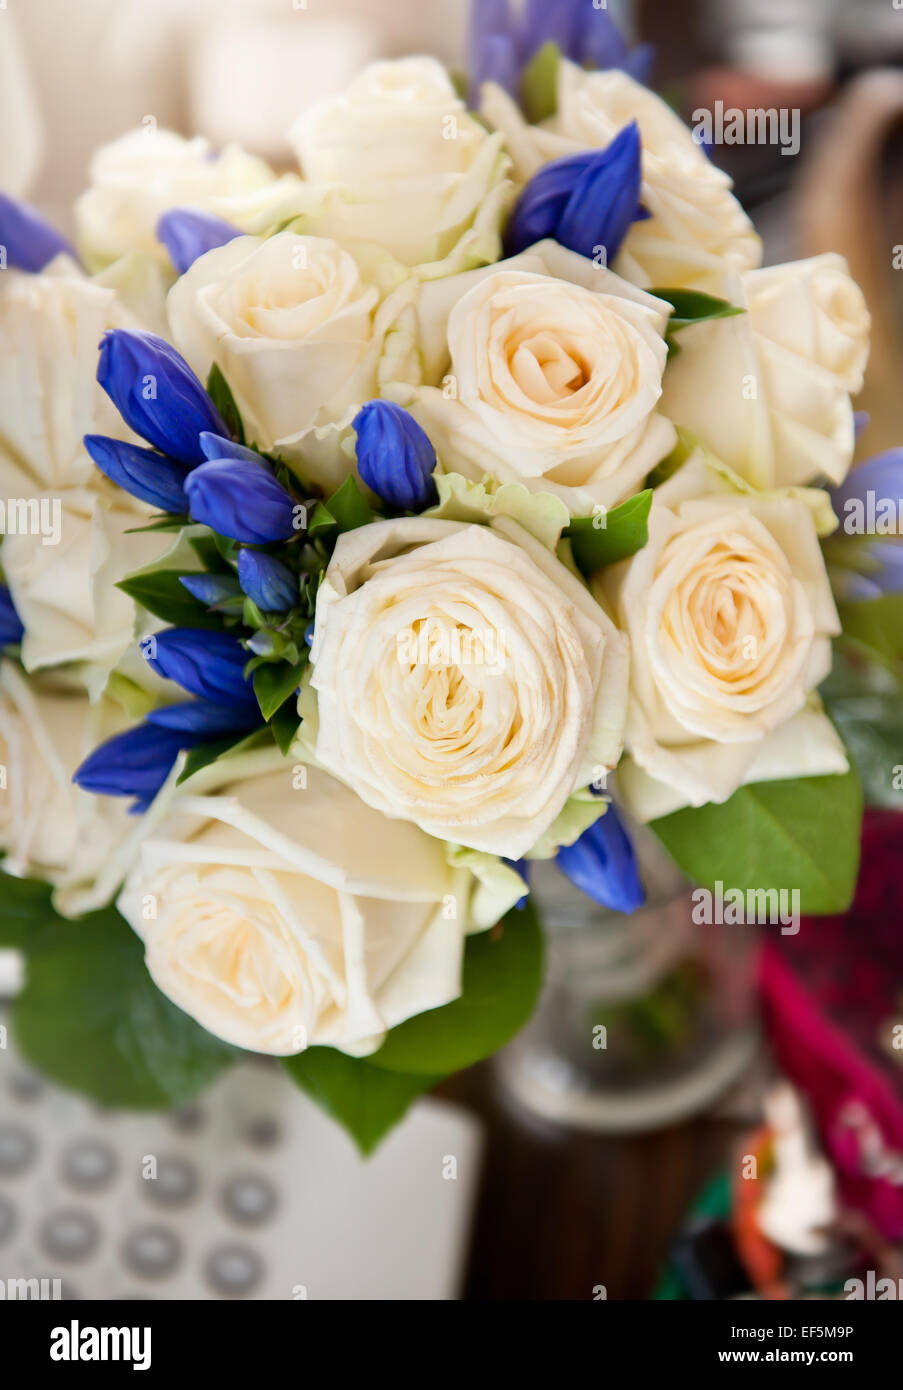 Ecru roses wedding bouquet stock photo 78187026 alamy ecru roses wedding bouquet izmirmasajfo